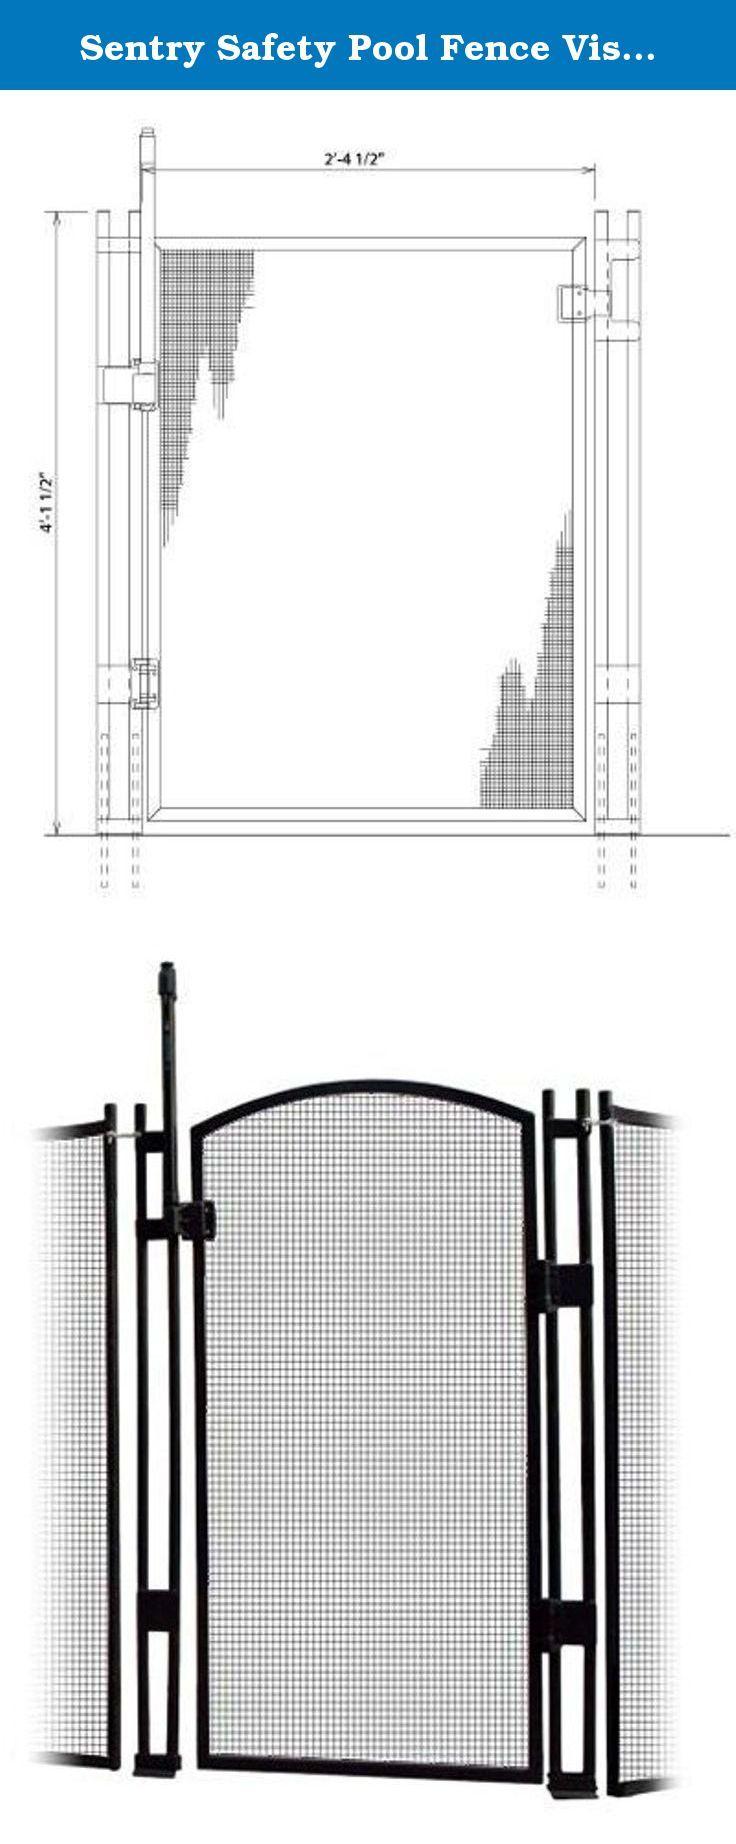 Sentry Safety Pool Fence Visiguard 5' Tall Self-closing